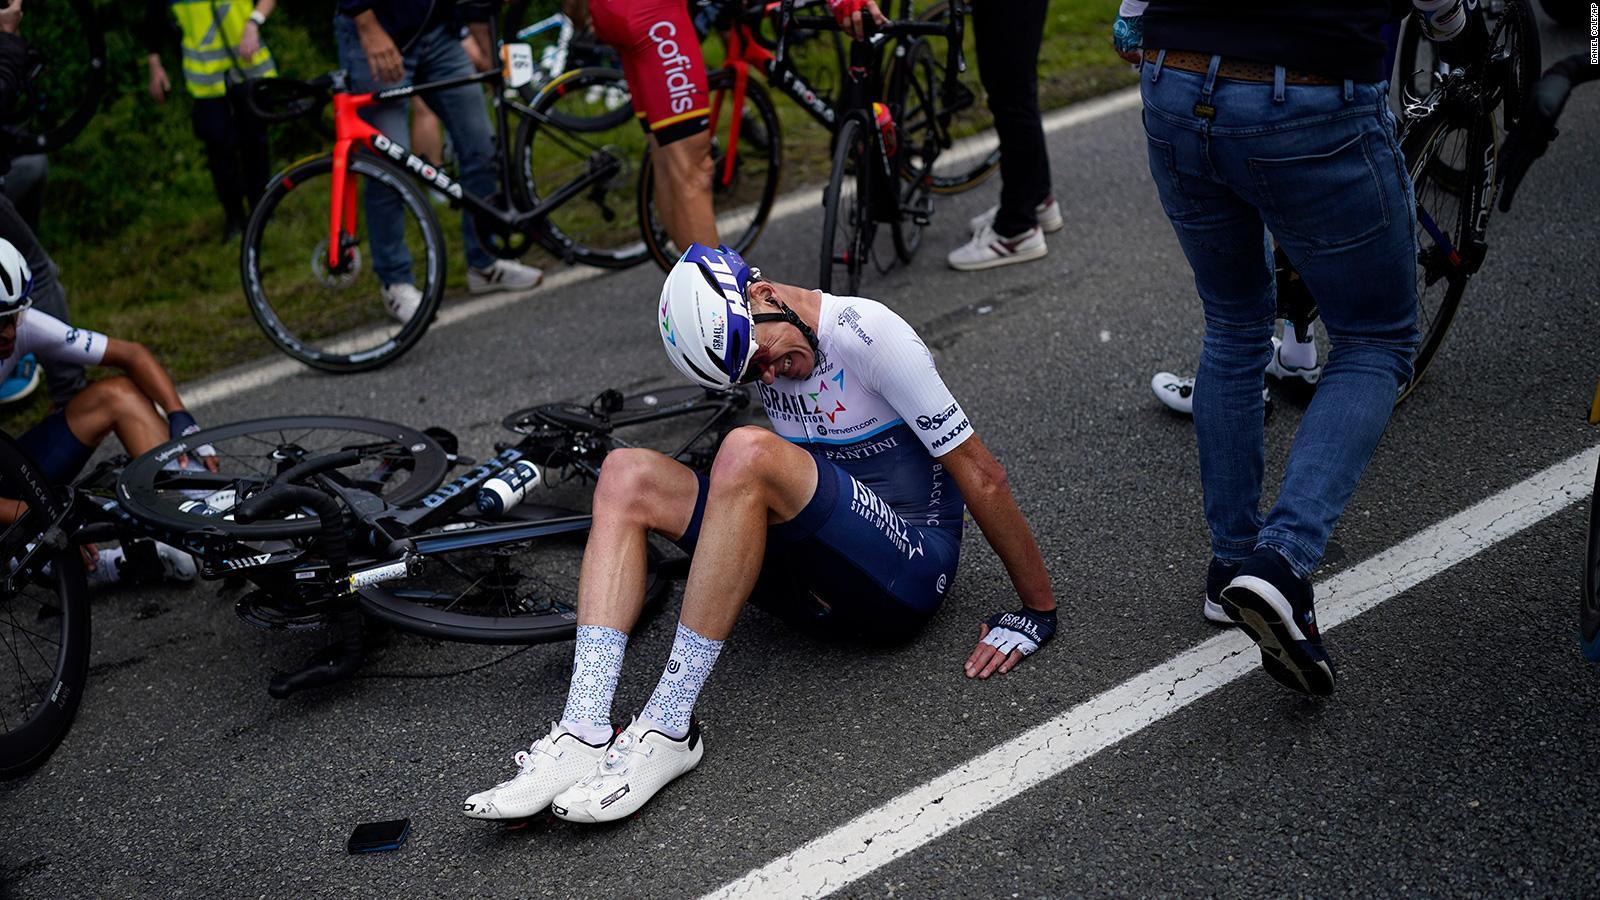 Watch Video: Spectator causes worst crash ever at Tour de